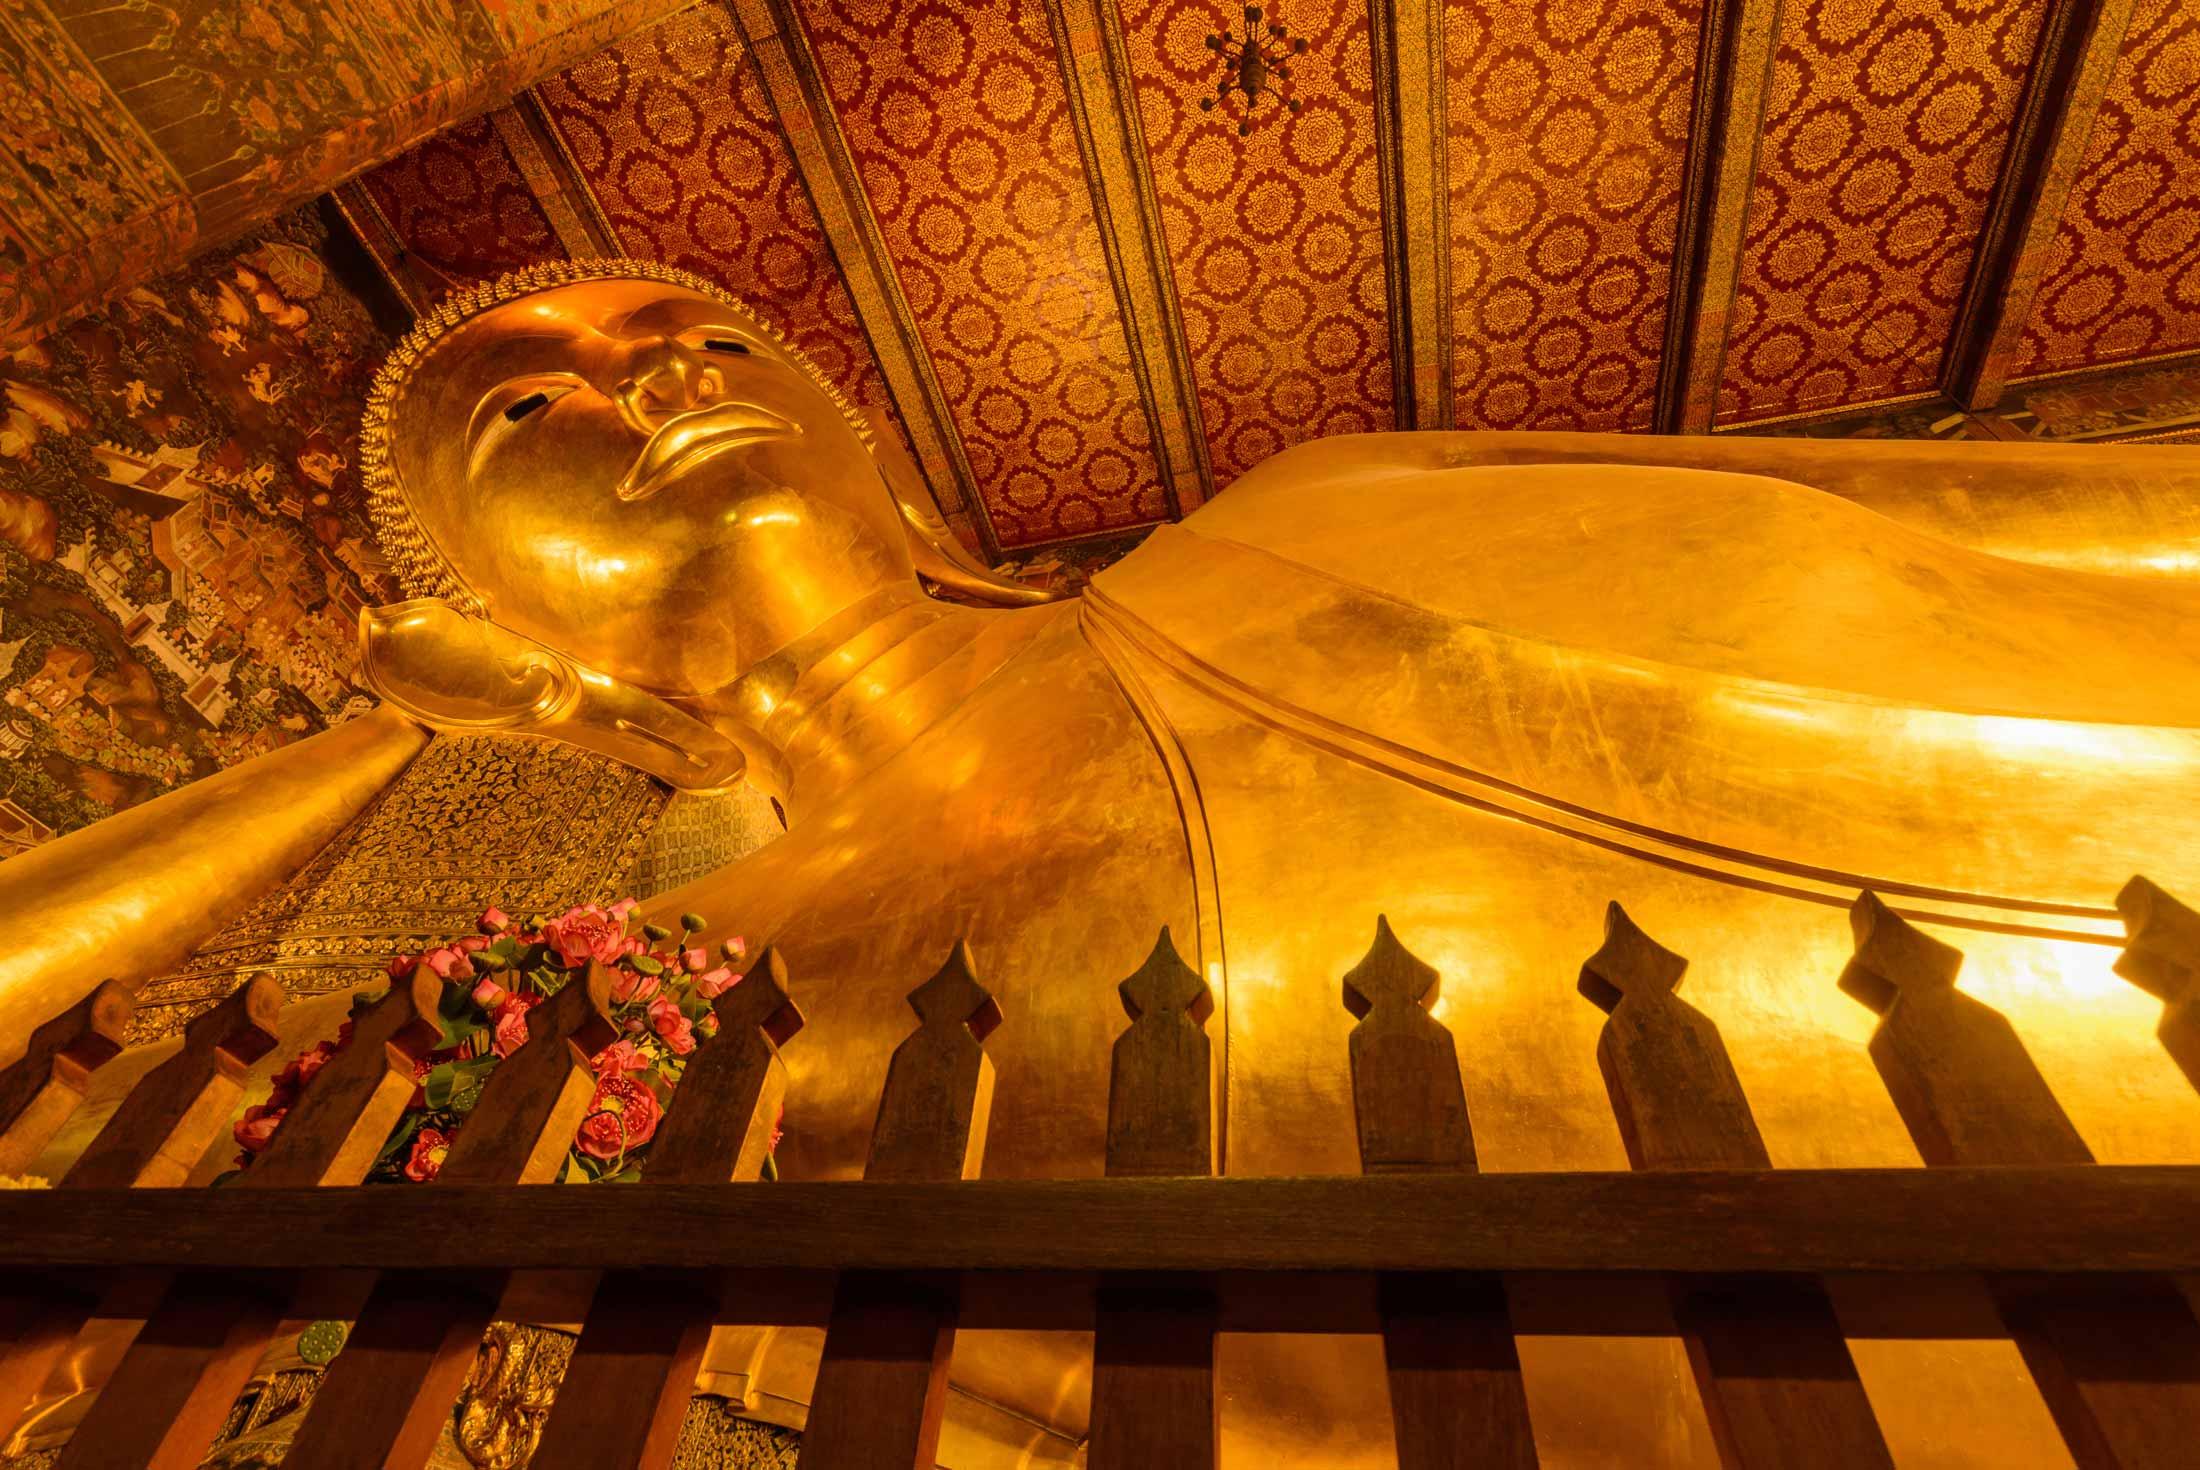 Family Thailand, Laos and Vietnam Holiday 3